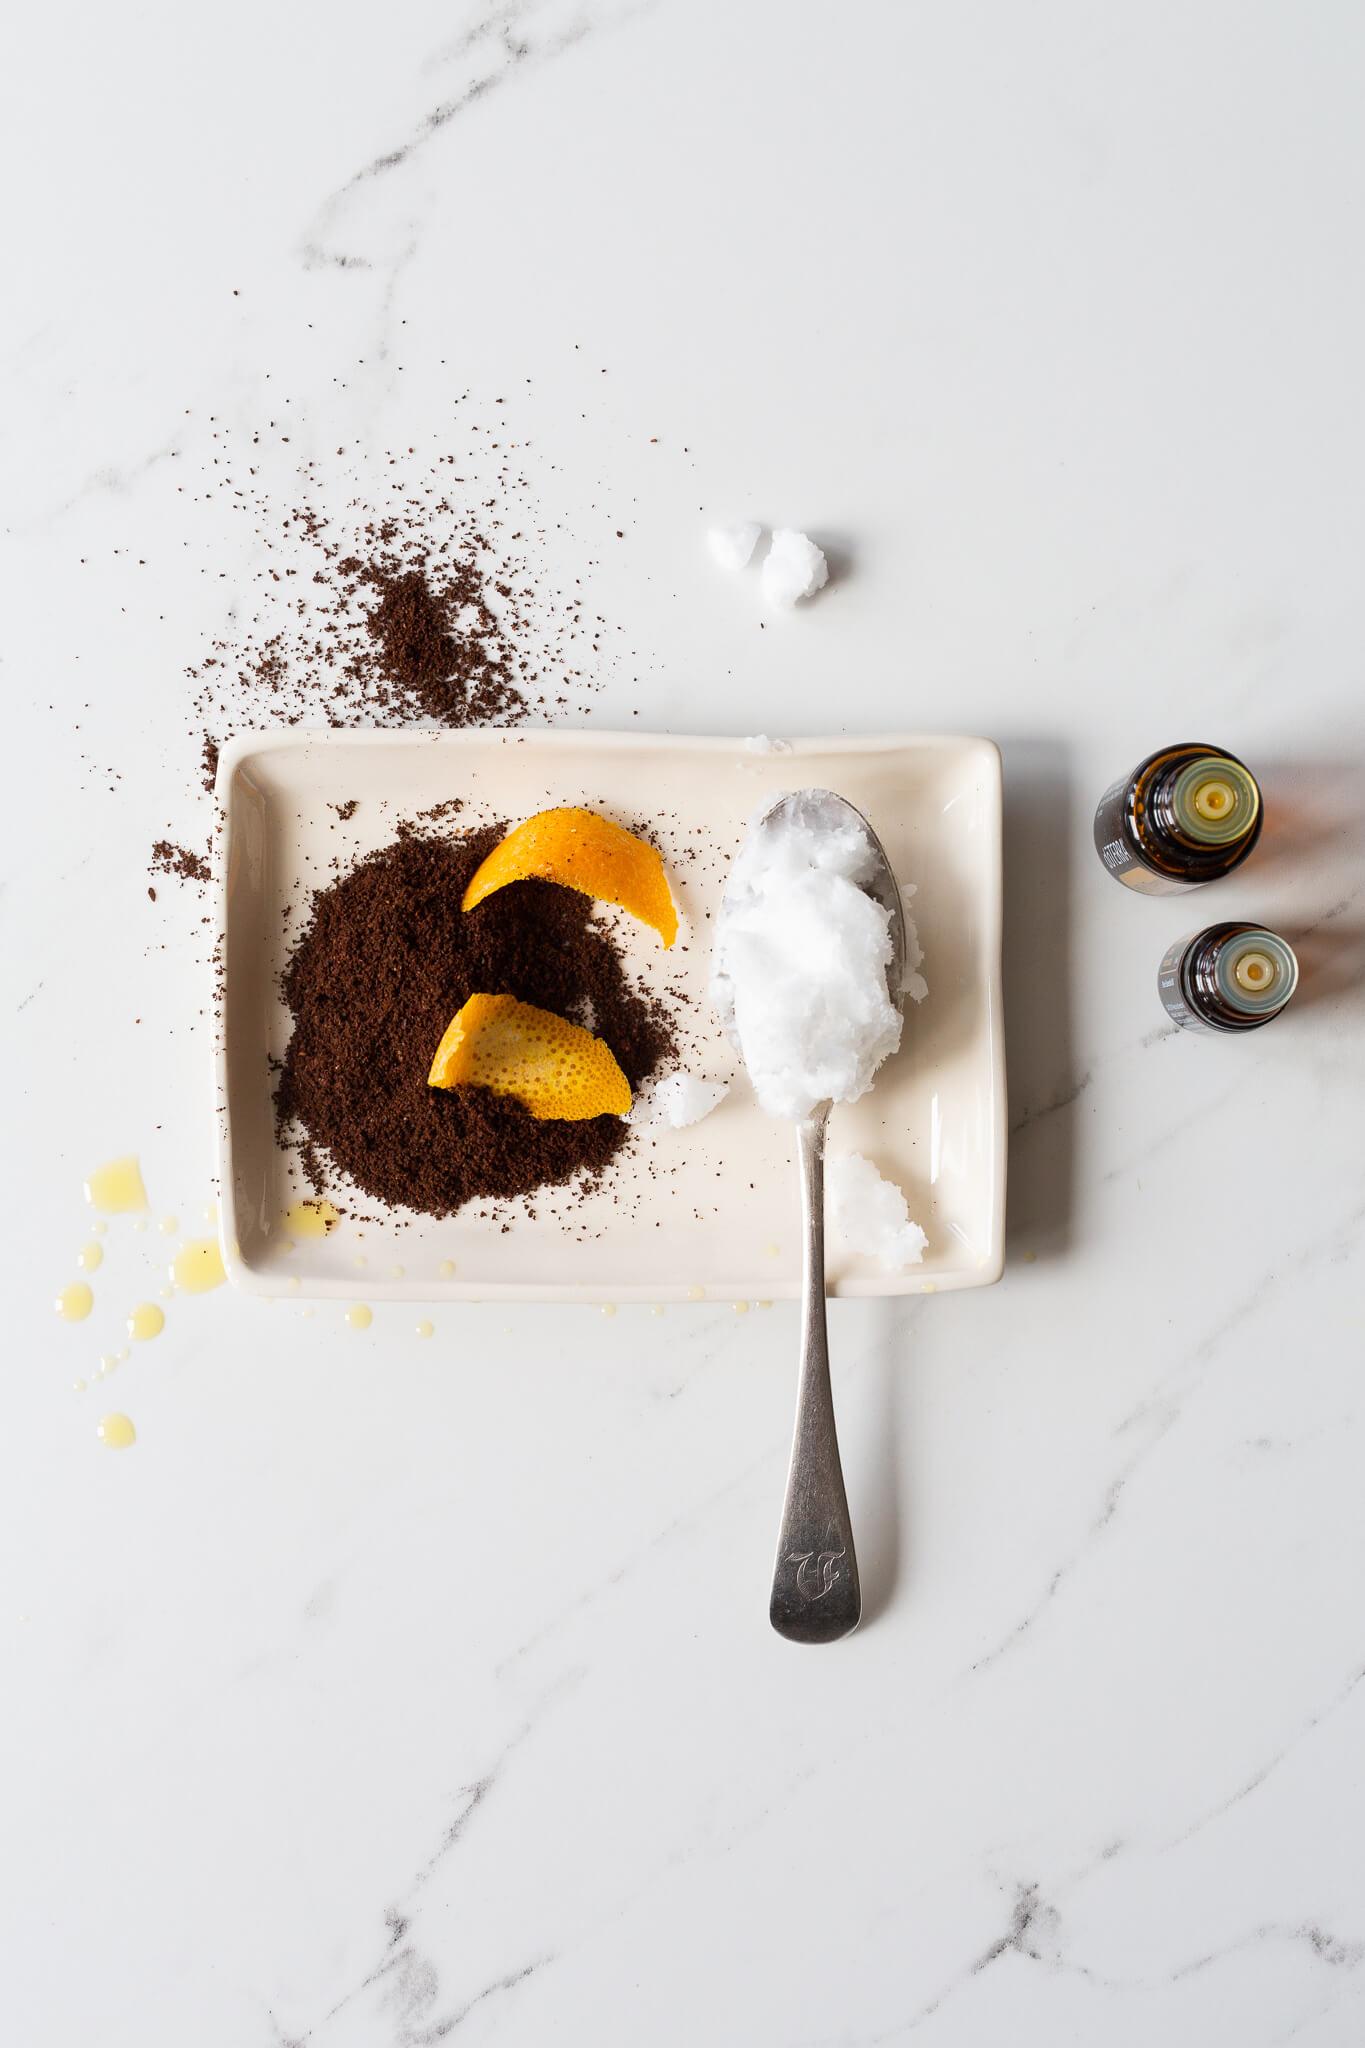 claire-mossongXwild-delicious (140 of 144).jpg